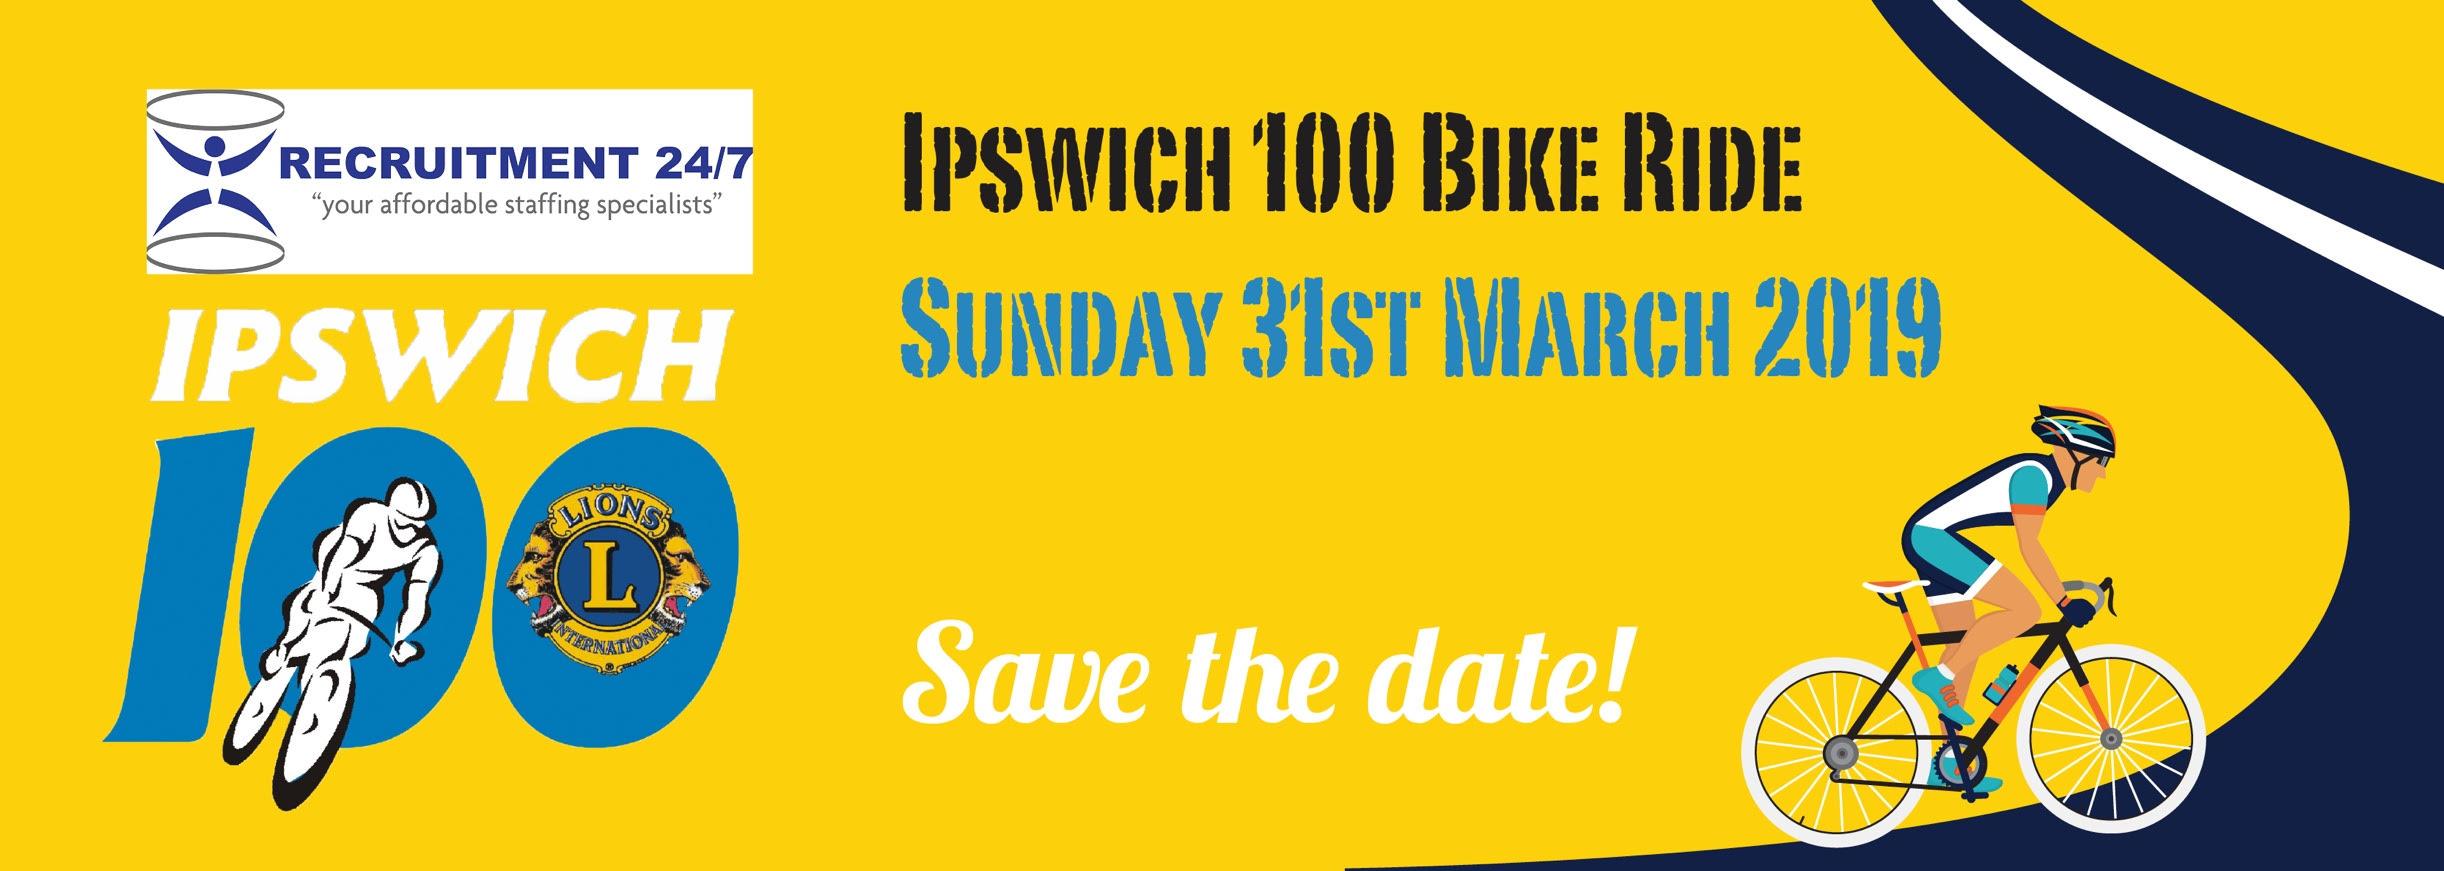 Ipswich 100